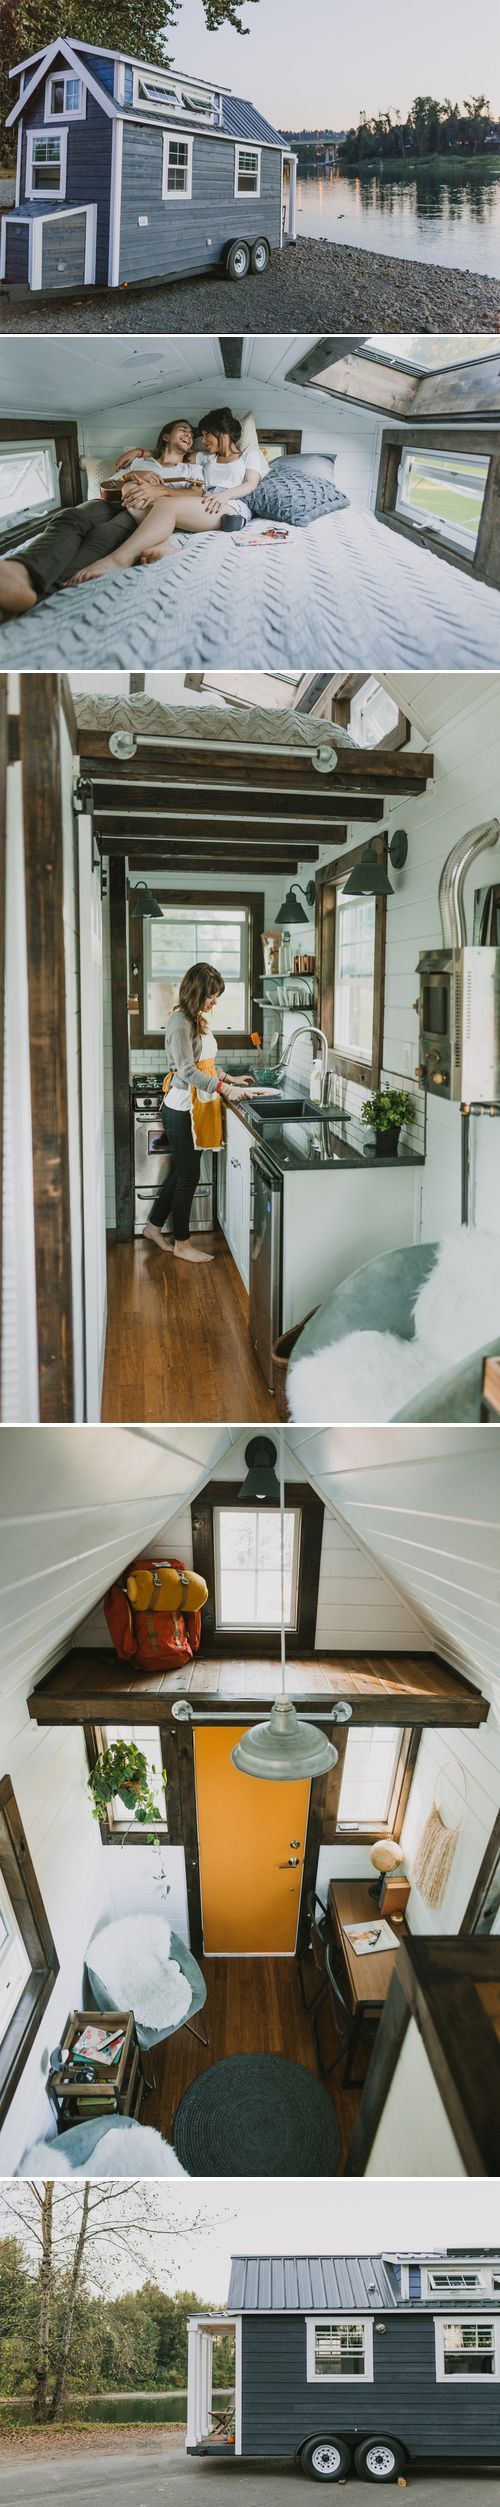 A custom tiny house on wheels in Oregon City, Oregon. Shared and built by Heirloom Custom Tiny Homes.